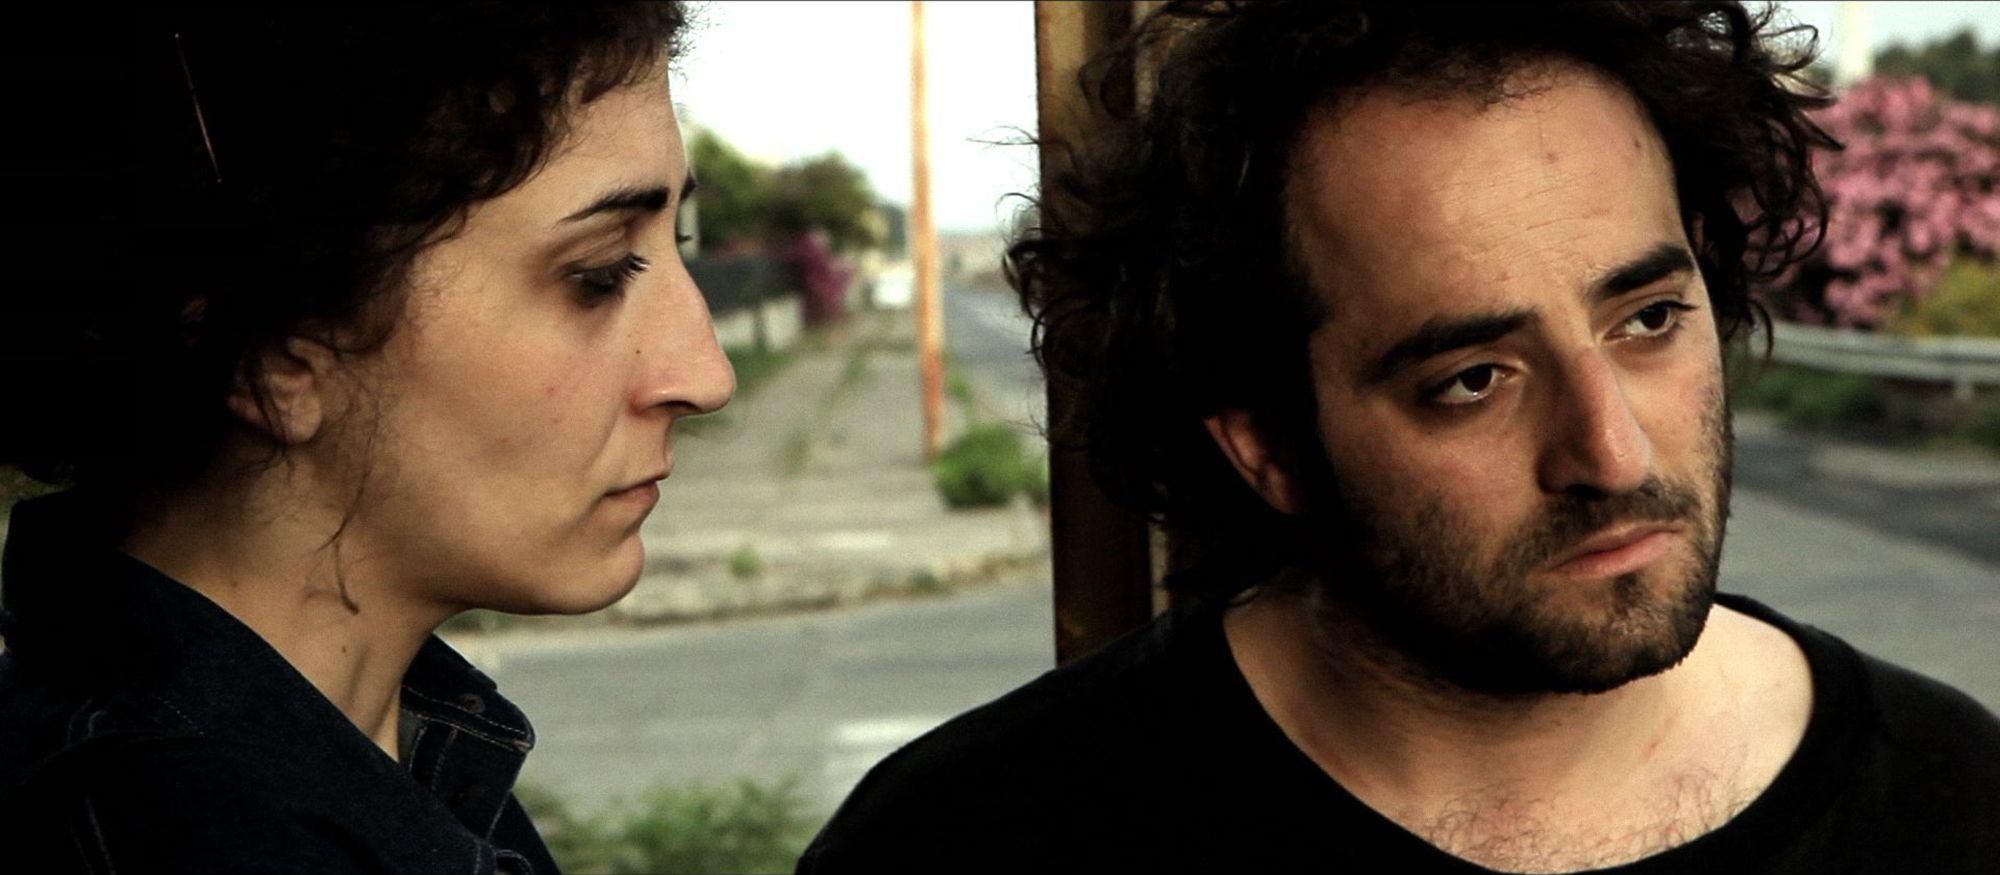 Watch Teresa Lourenco TTO video